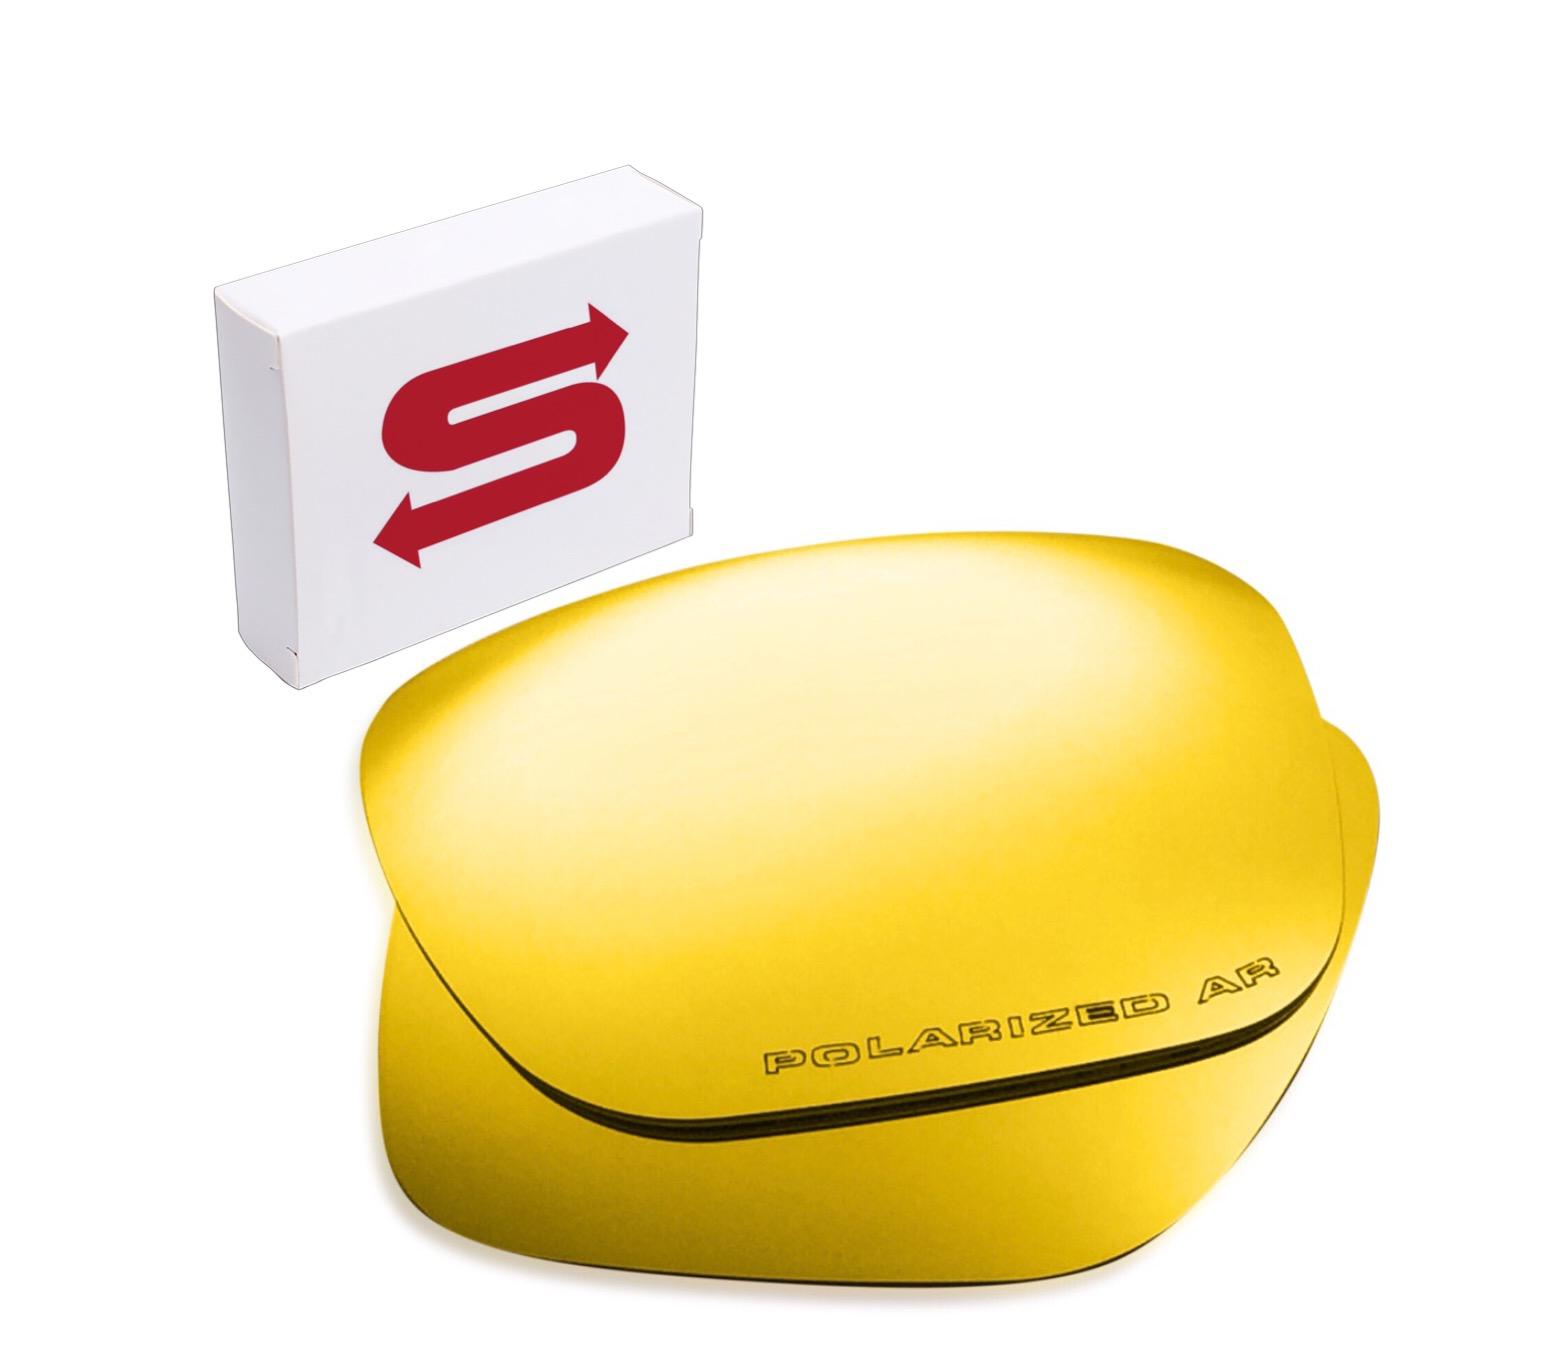 6ee97795e GOLD Oakley Holbrook Lenses POLARIZED by Lens Swap | Lens Swap ...